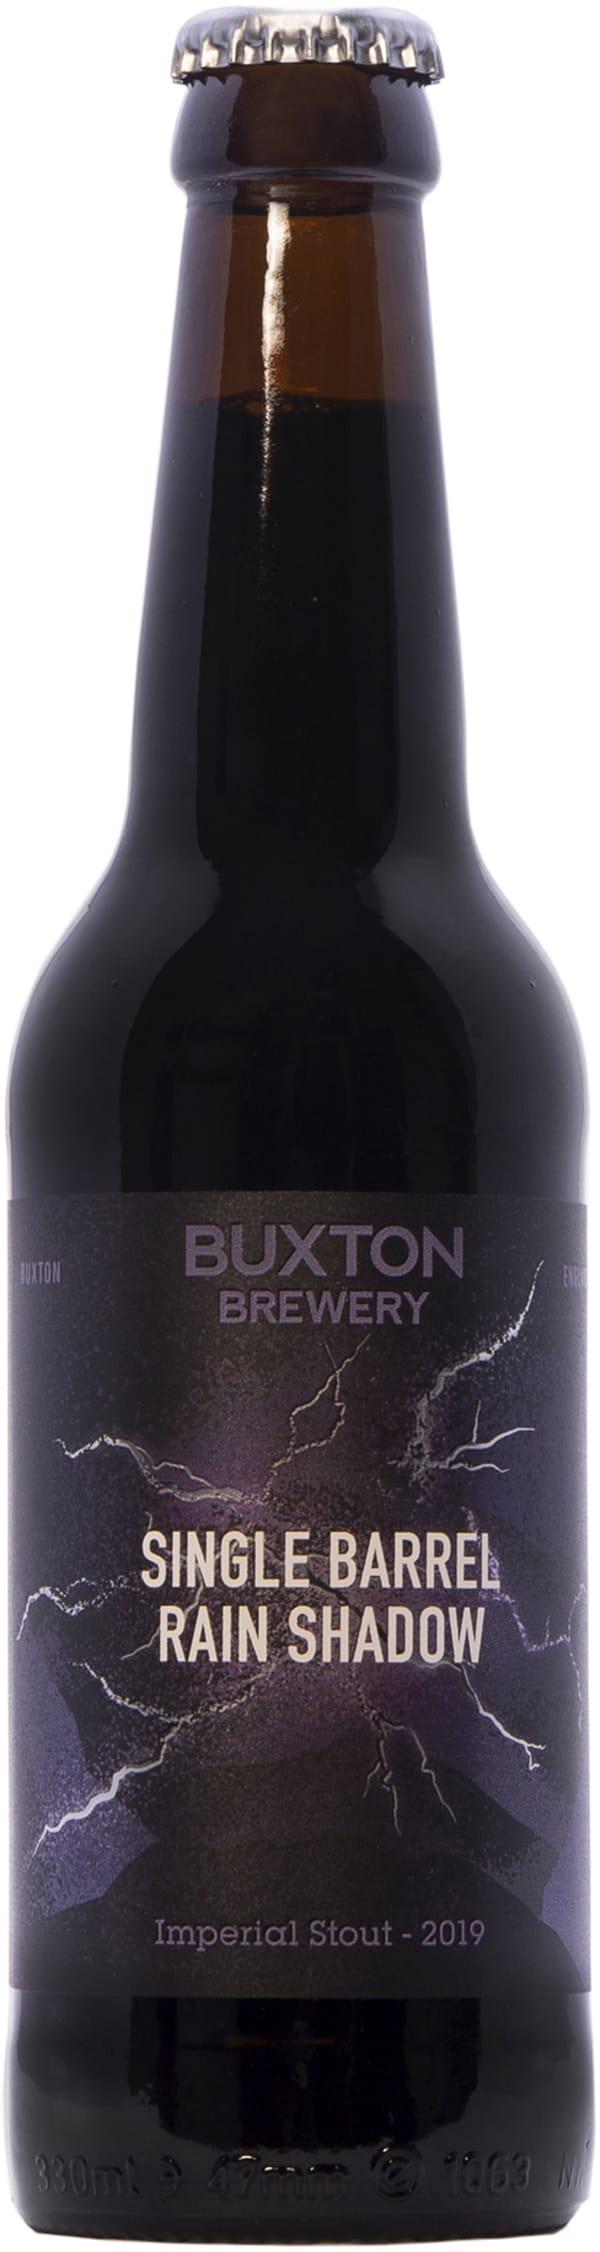 Buxton Single Barrel Rain Shadow